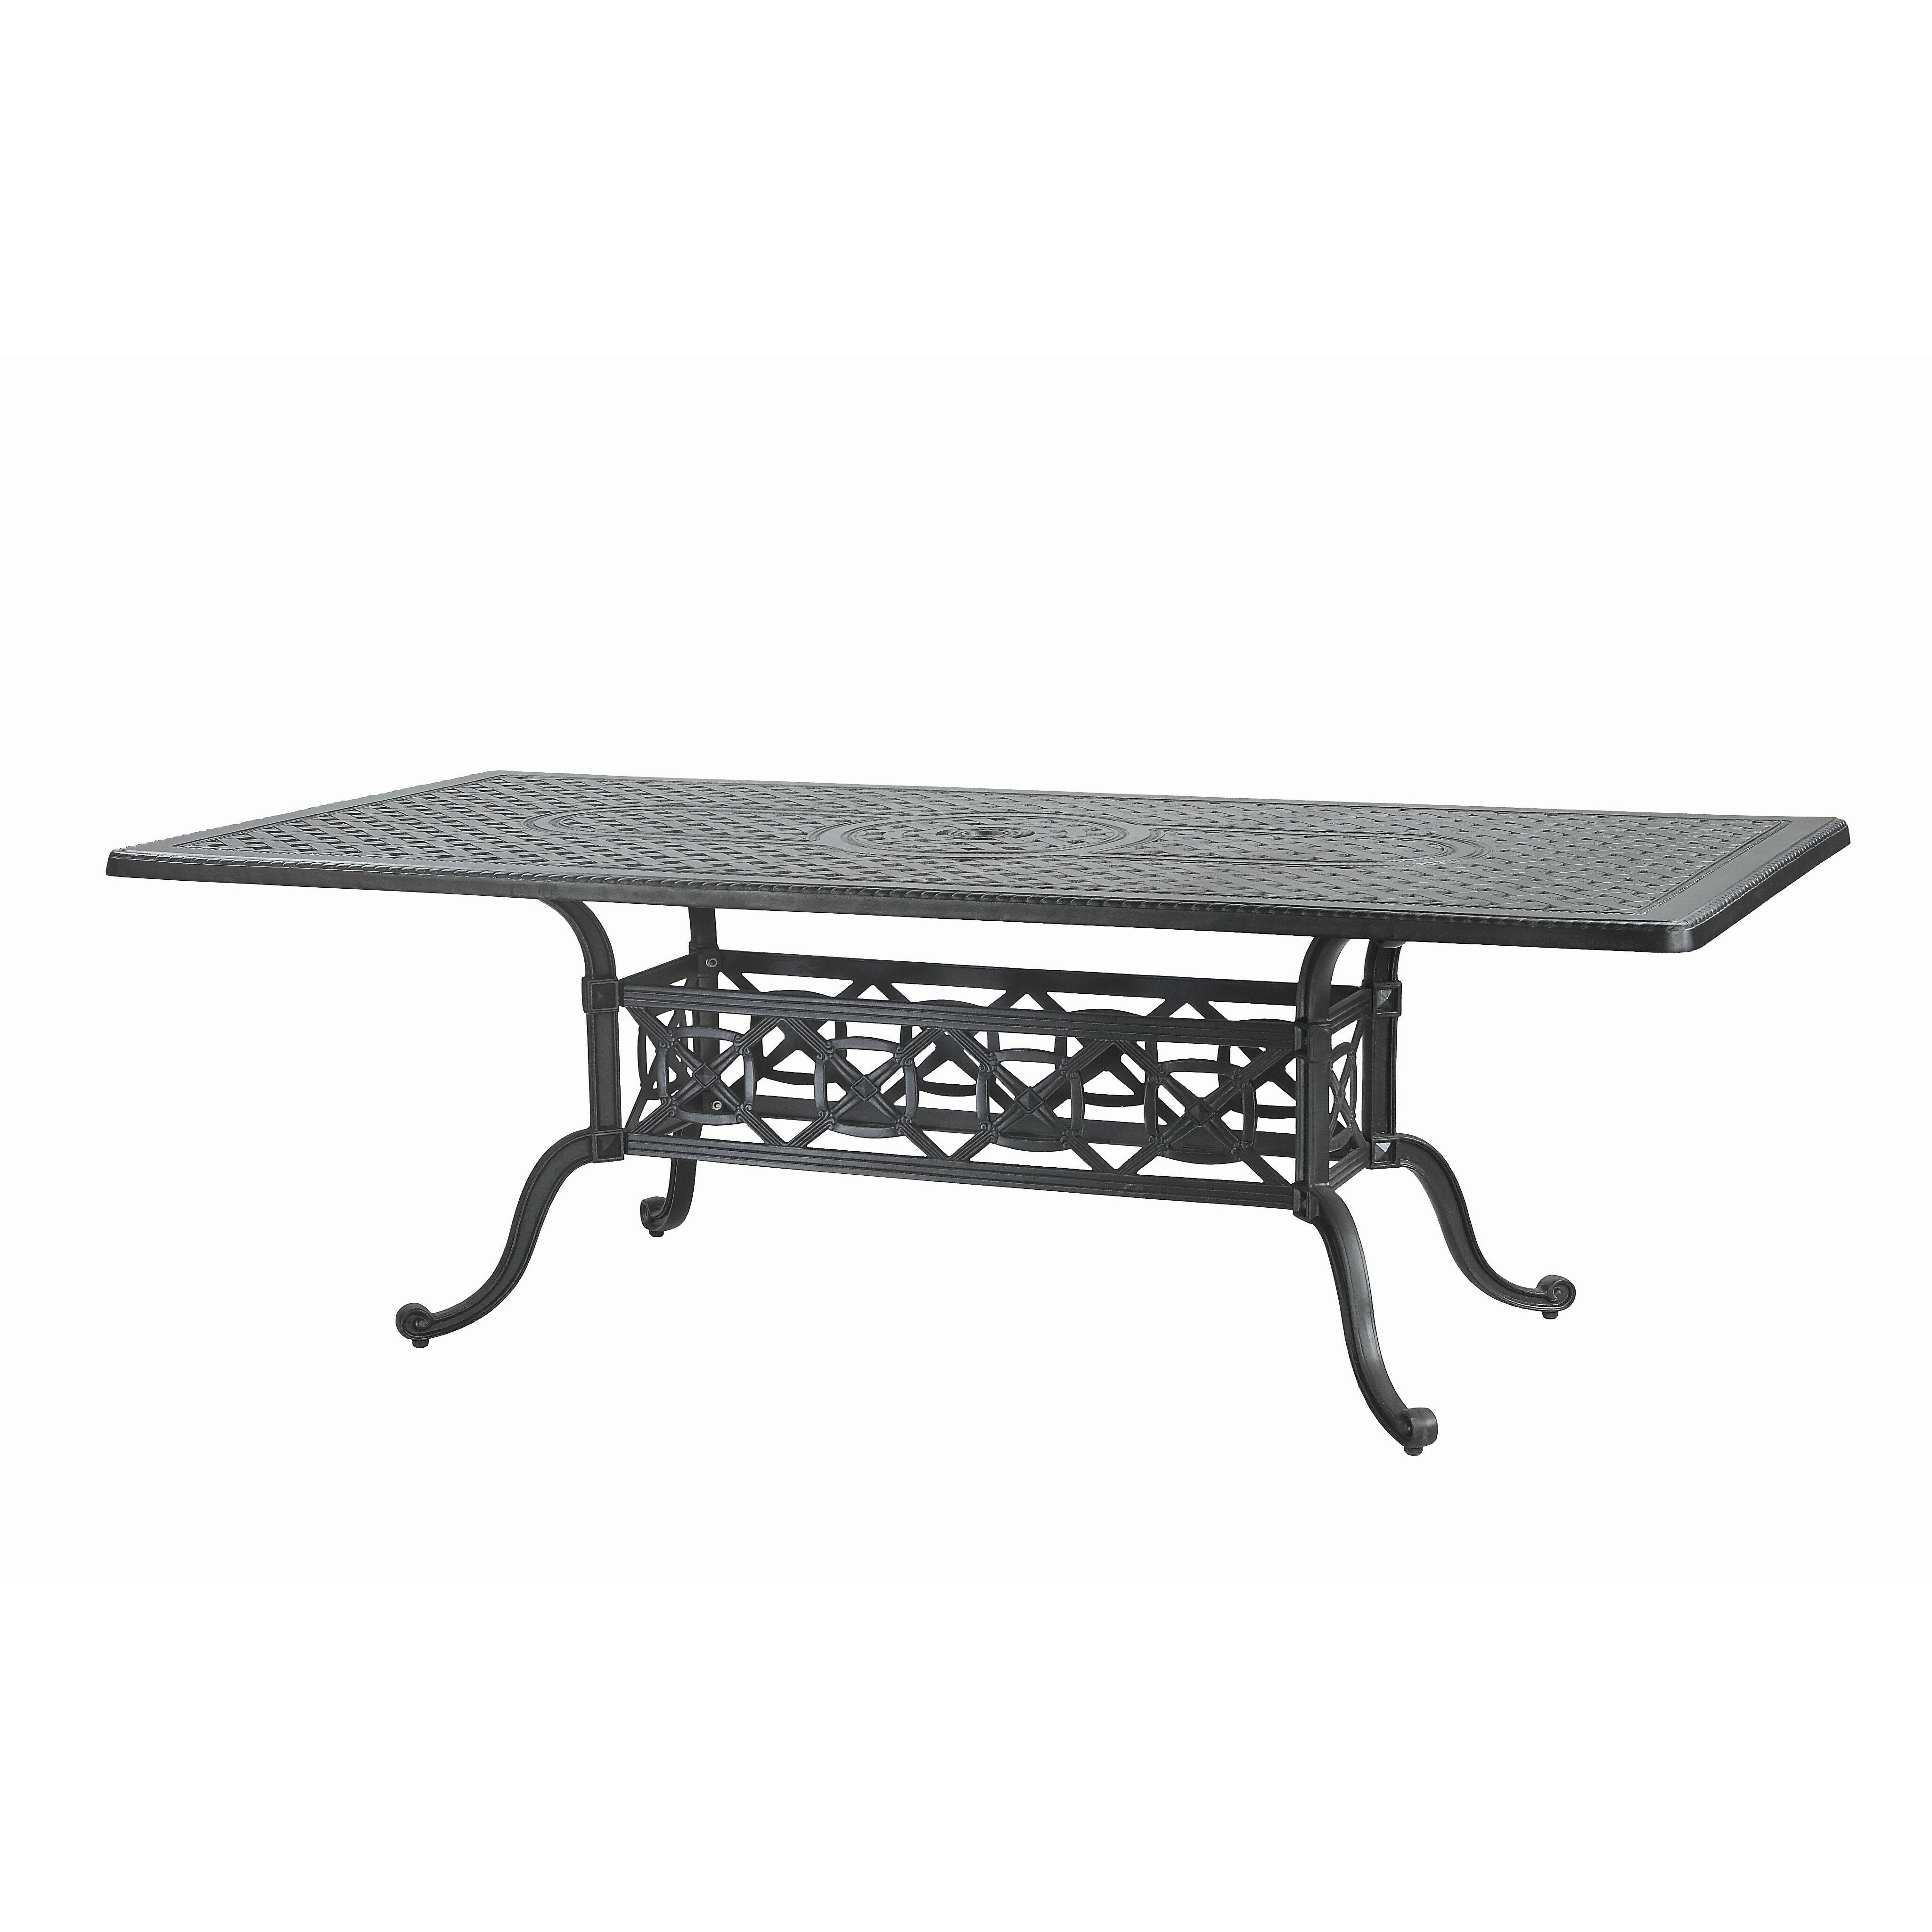 Gensun Casual Living : Gensun Casual Grand Terrace Dining Table  Wayfair